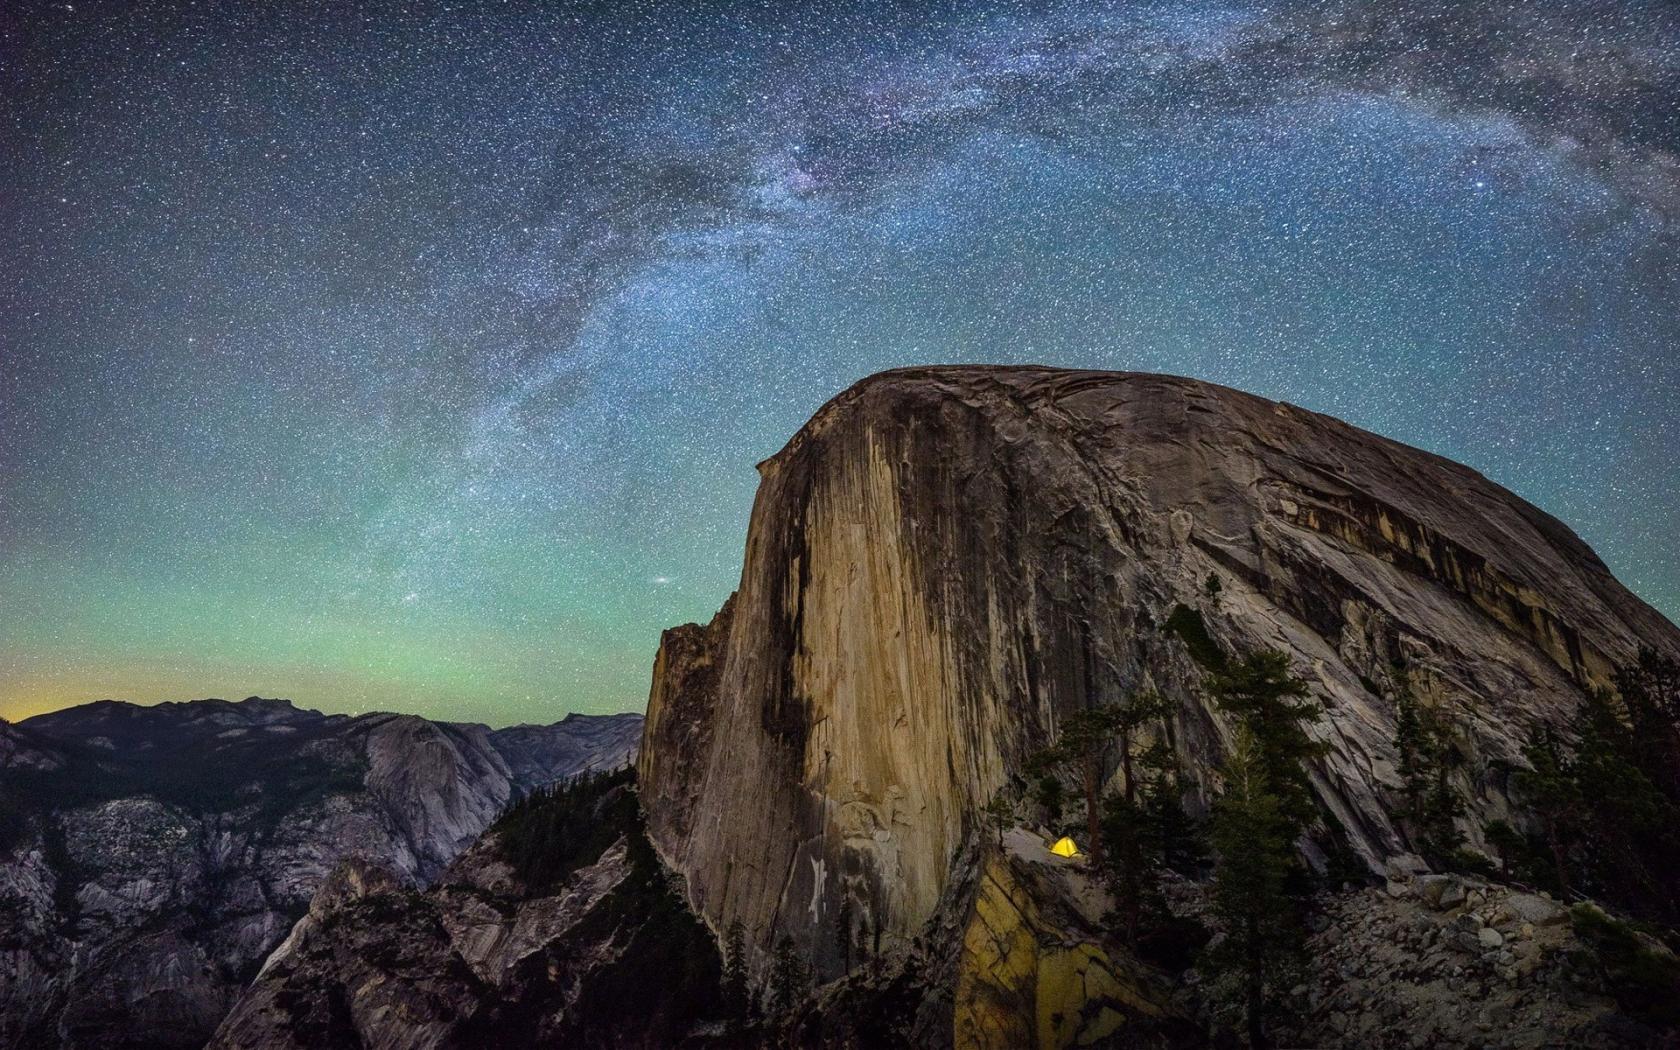 download Yosemite Camp 1080p Wallpaper New HD Wallpapers 1680x1050